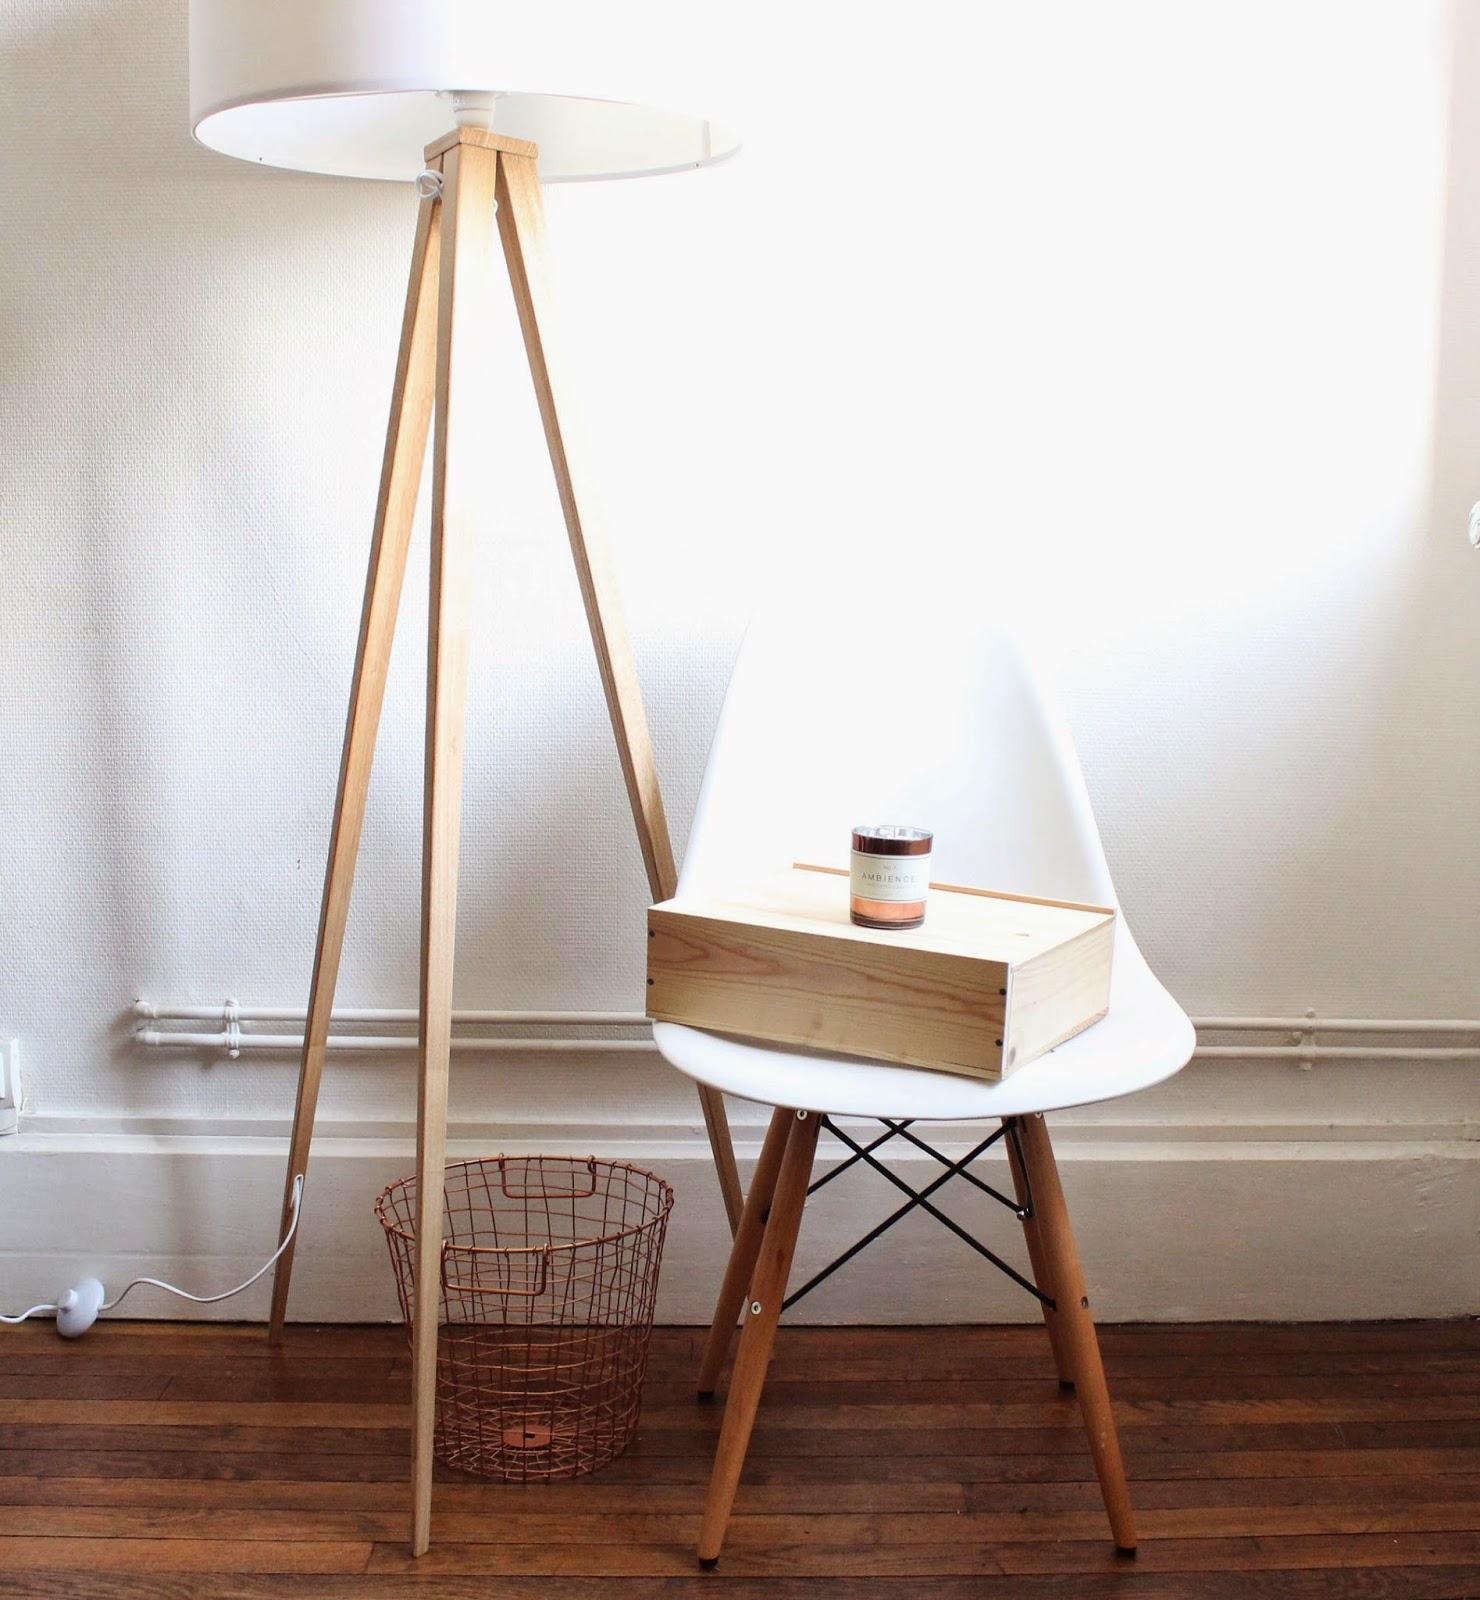 my happy chair bon plan les tendances by marina blog mode d co voyage lifestyle. Black Bedroom Furniture Sets. Home Design Ideas